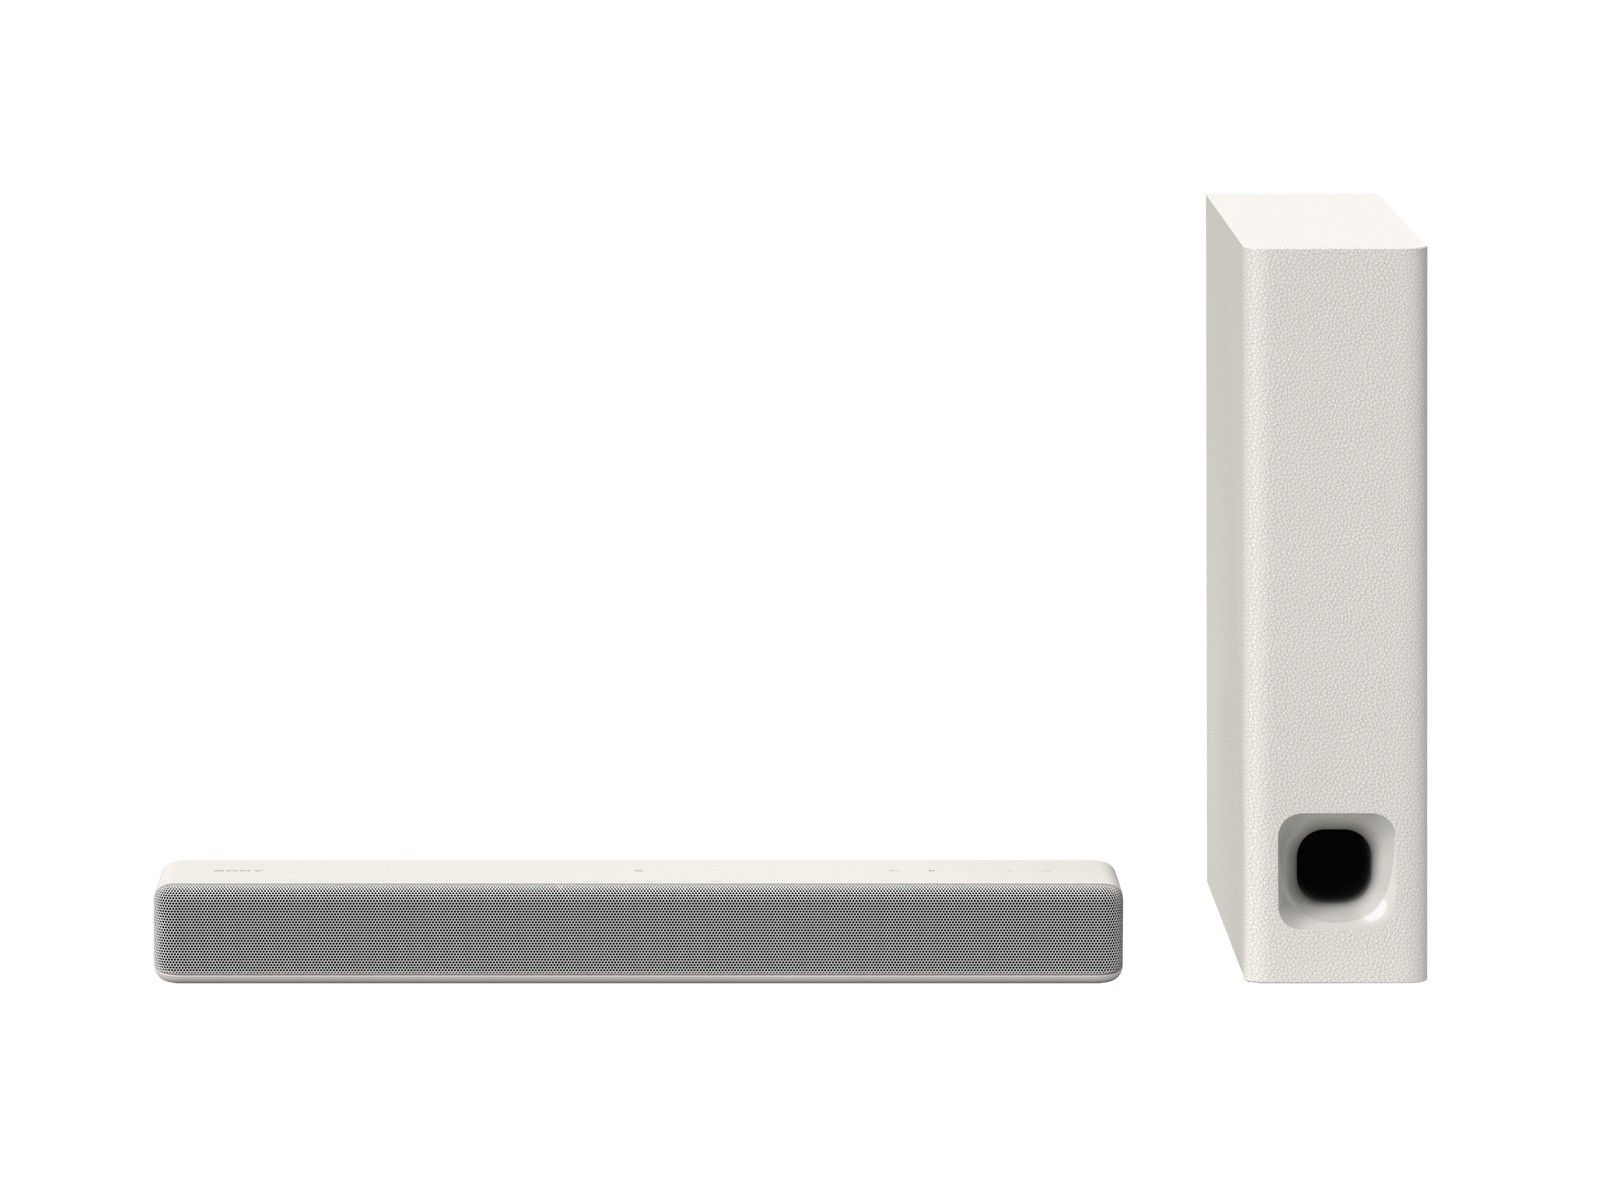 Sony Htmt301 Wireless White Soundbar Speaker 249 00 Soundbars Sony Free Delivery All Over Cyprus Follow Us For The La Sound Bar Subwoofer Wireless